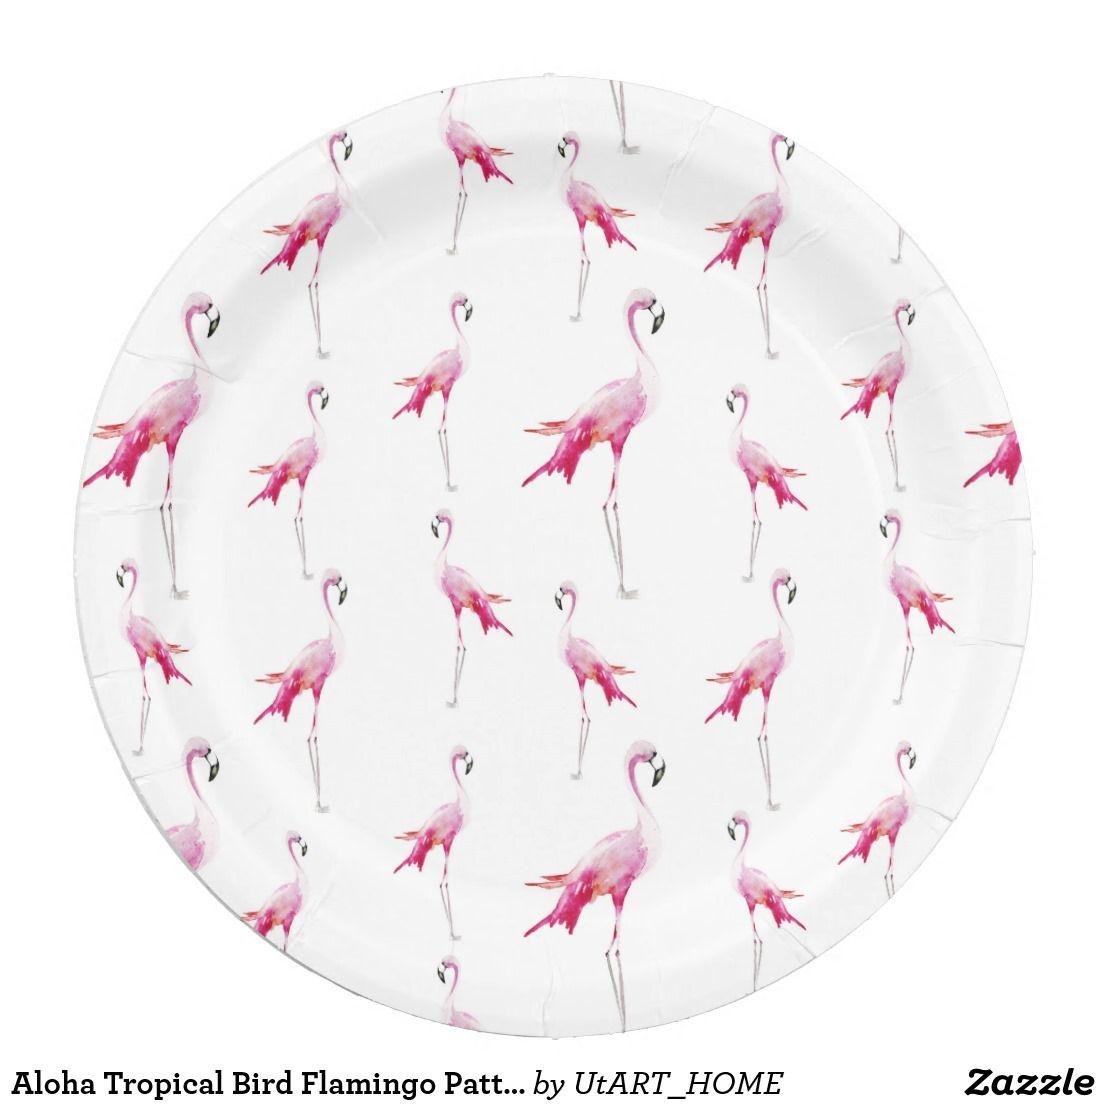 Aloha Tropical Bird Flamingo Pattern Paper Plate  sc 1 st  Pinterest & Aloha Tropical Bird Flamingo Pattern Paper Plate | Flamingo pattern